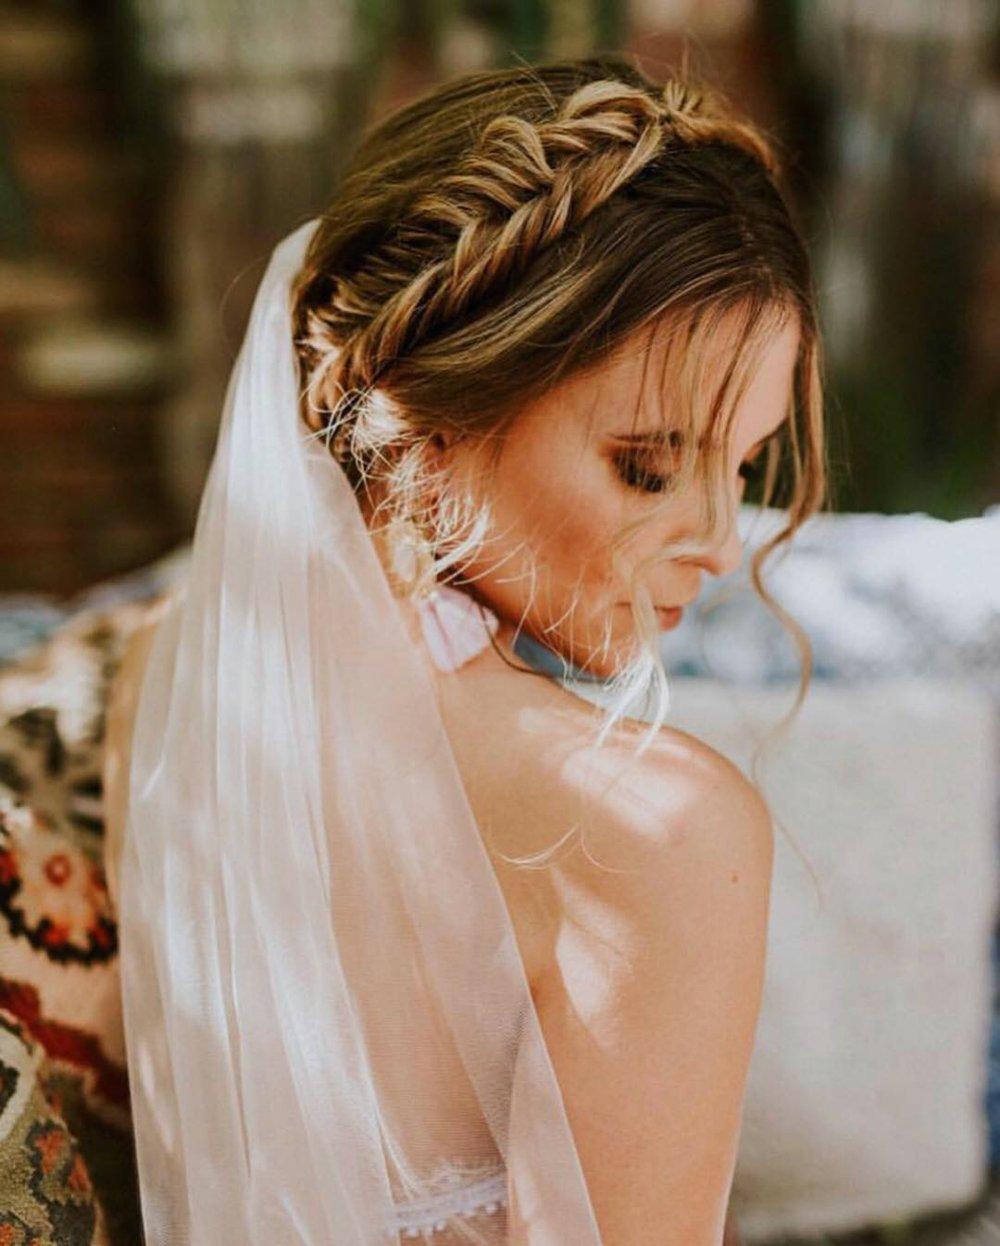 Photographer: Alyssa Strongarm | Hair: Jennifer Mau | Makeup by Ashley Tani